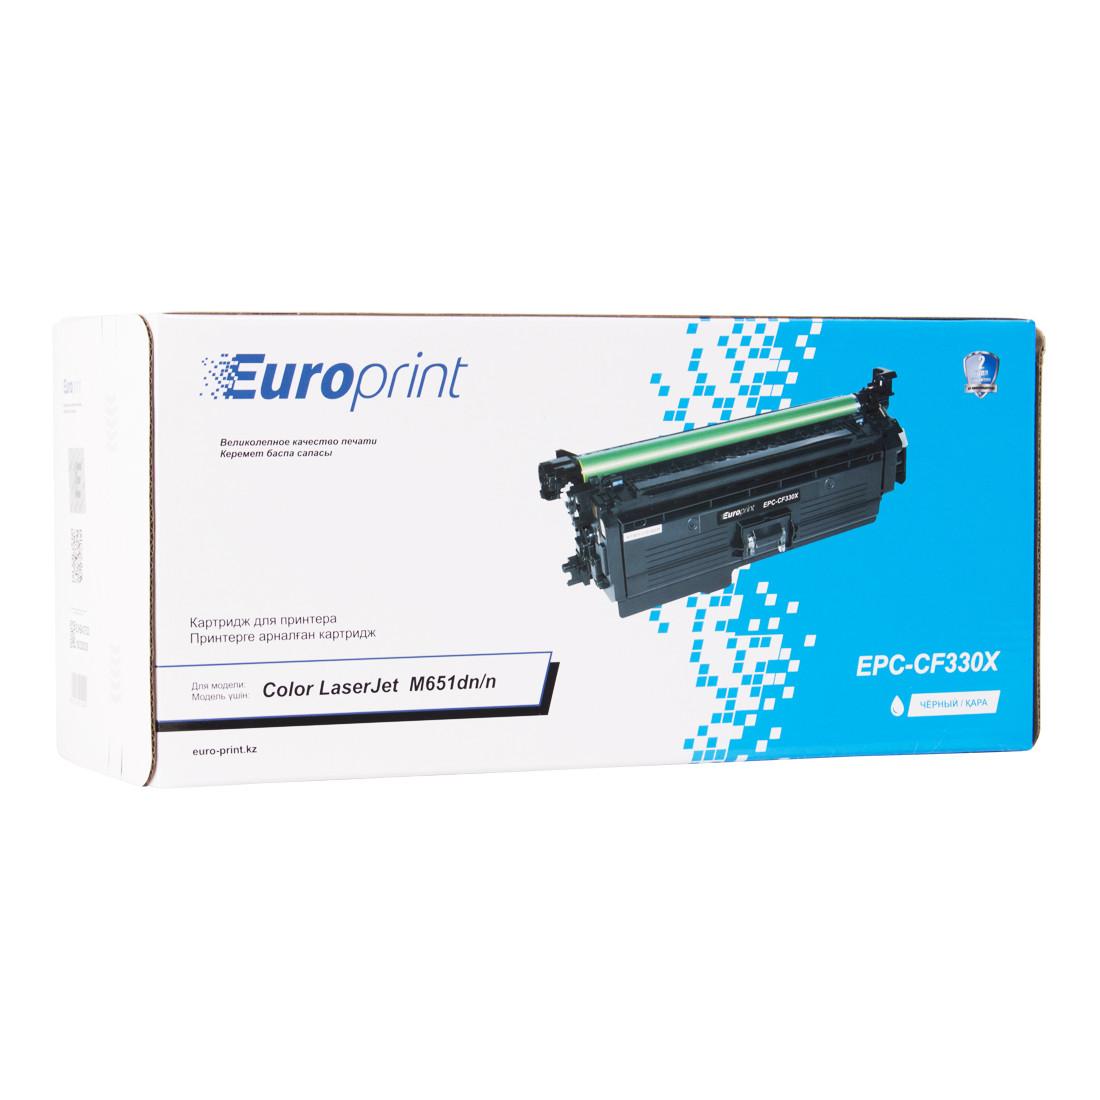 Картридж Europrint EPC-CF330X Black (20500 страниц)